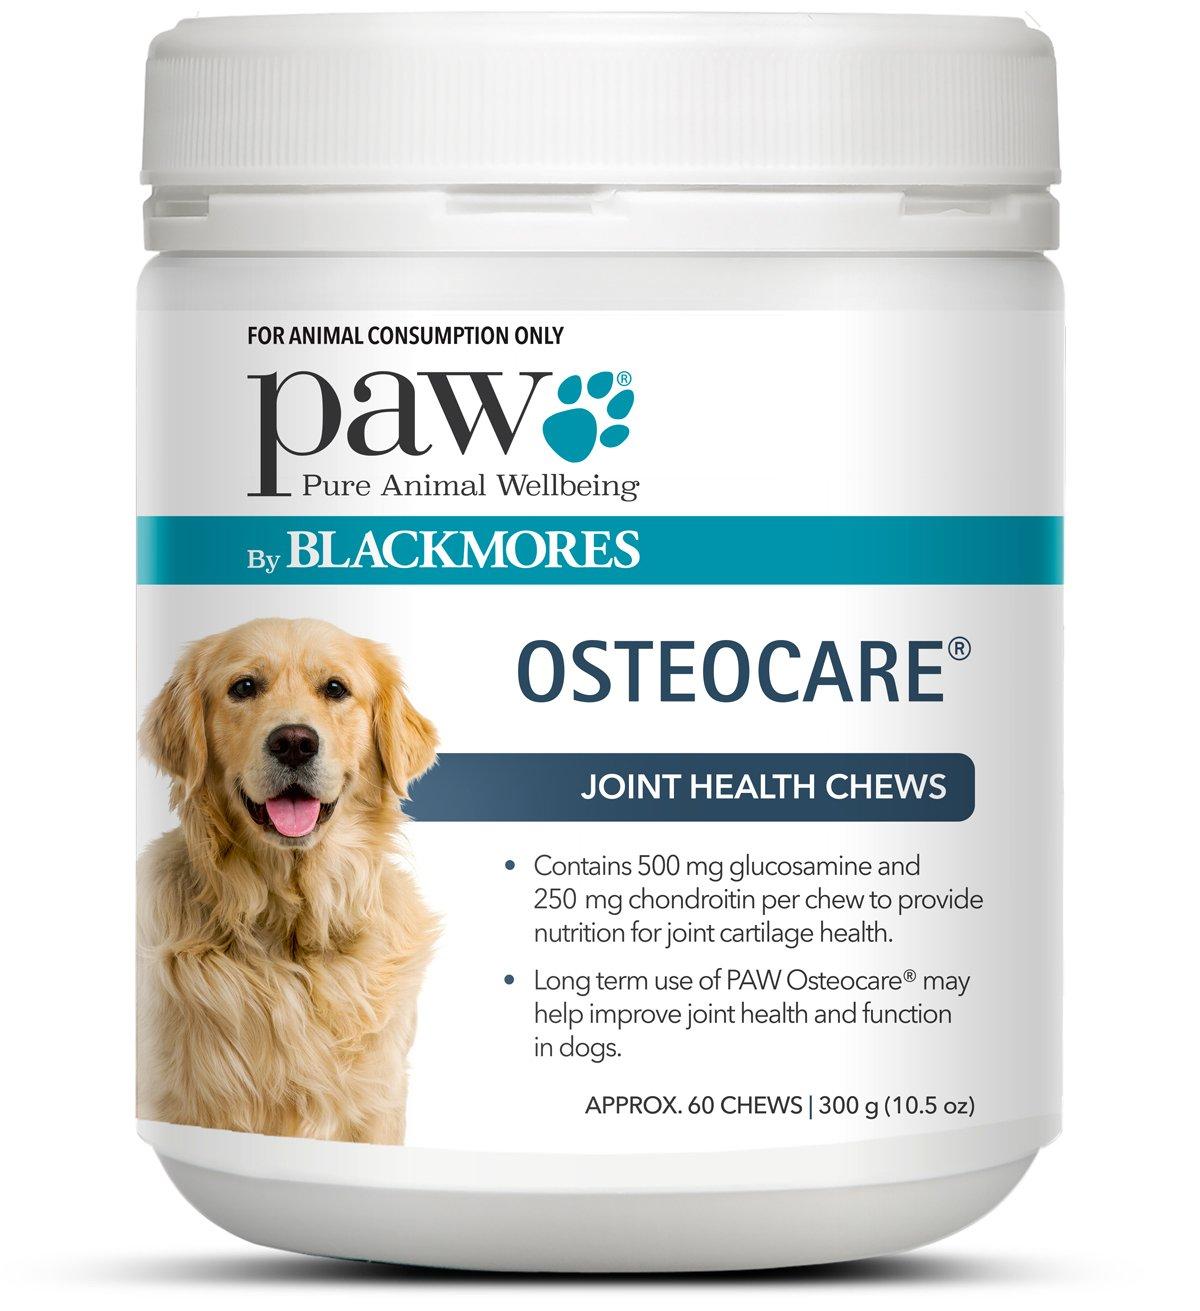 PAW Osteocare Chews (300g)